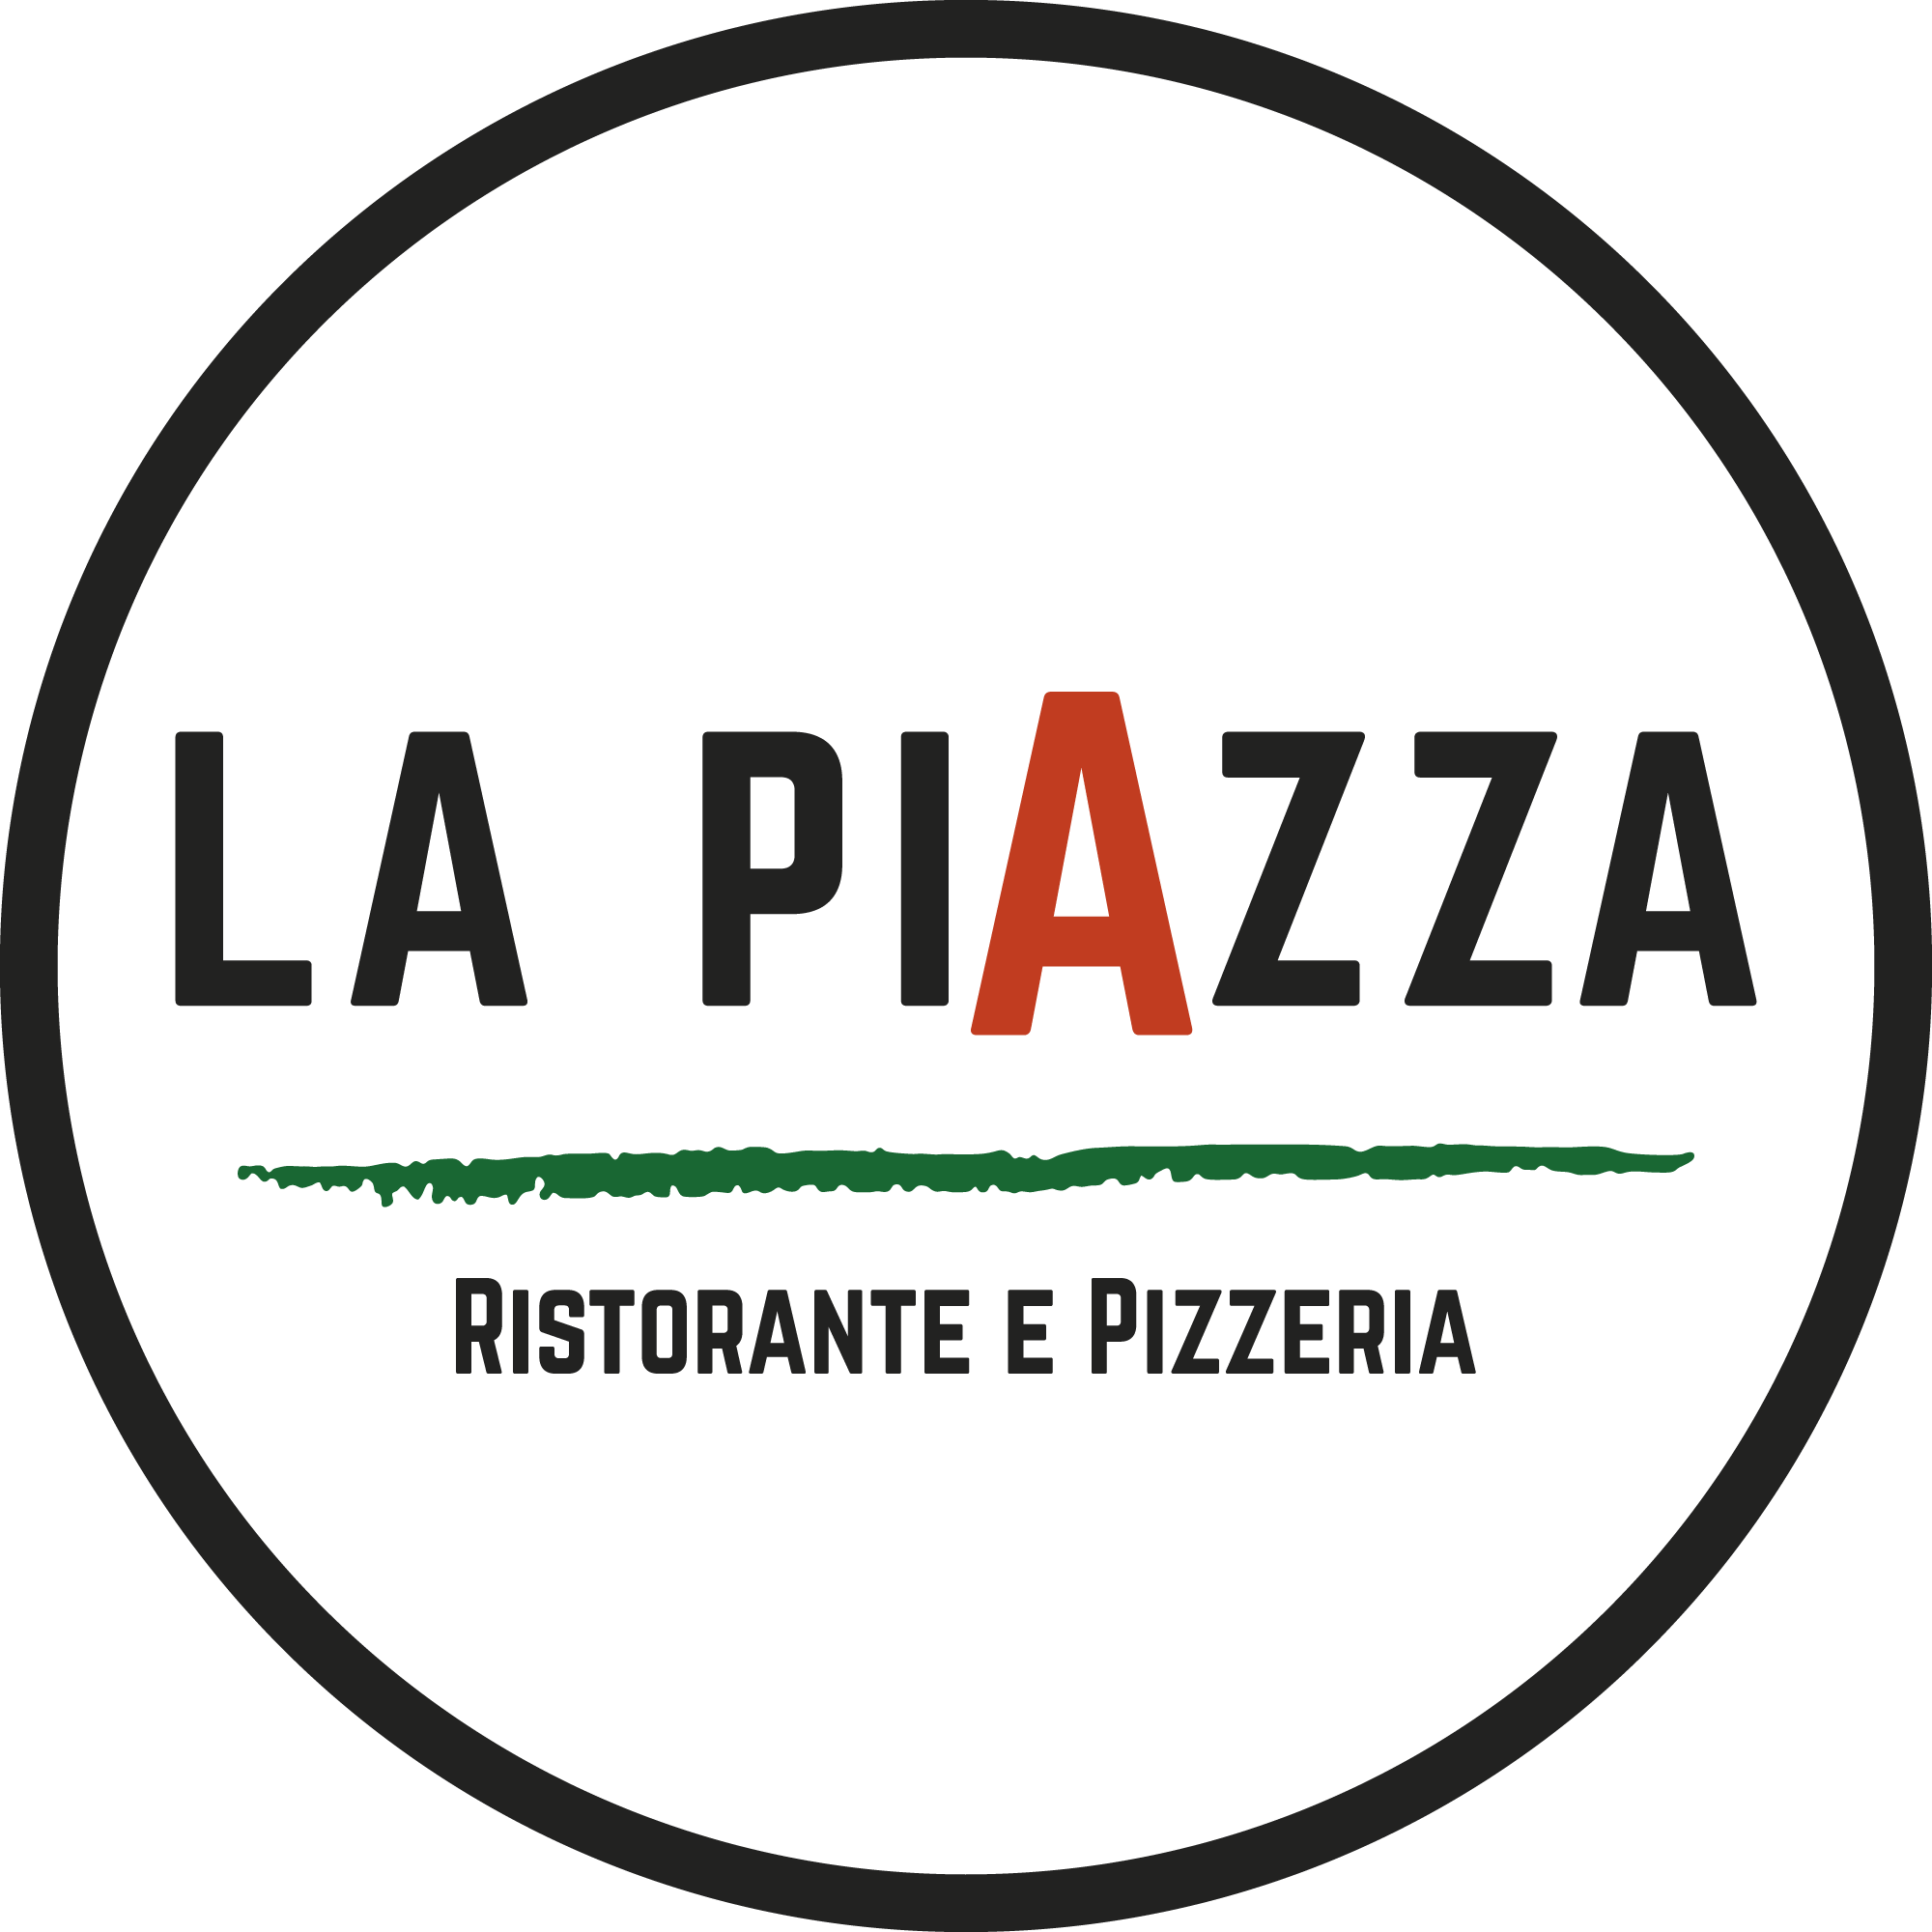 LaPiazza